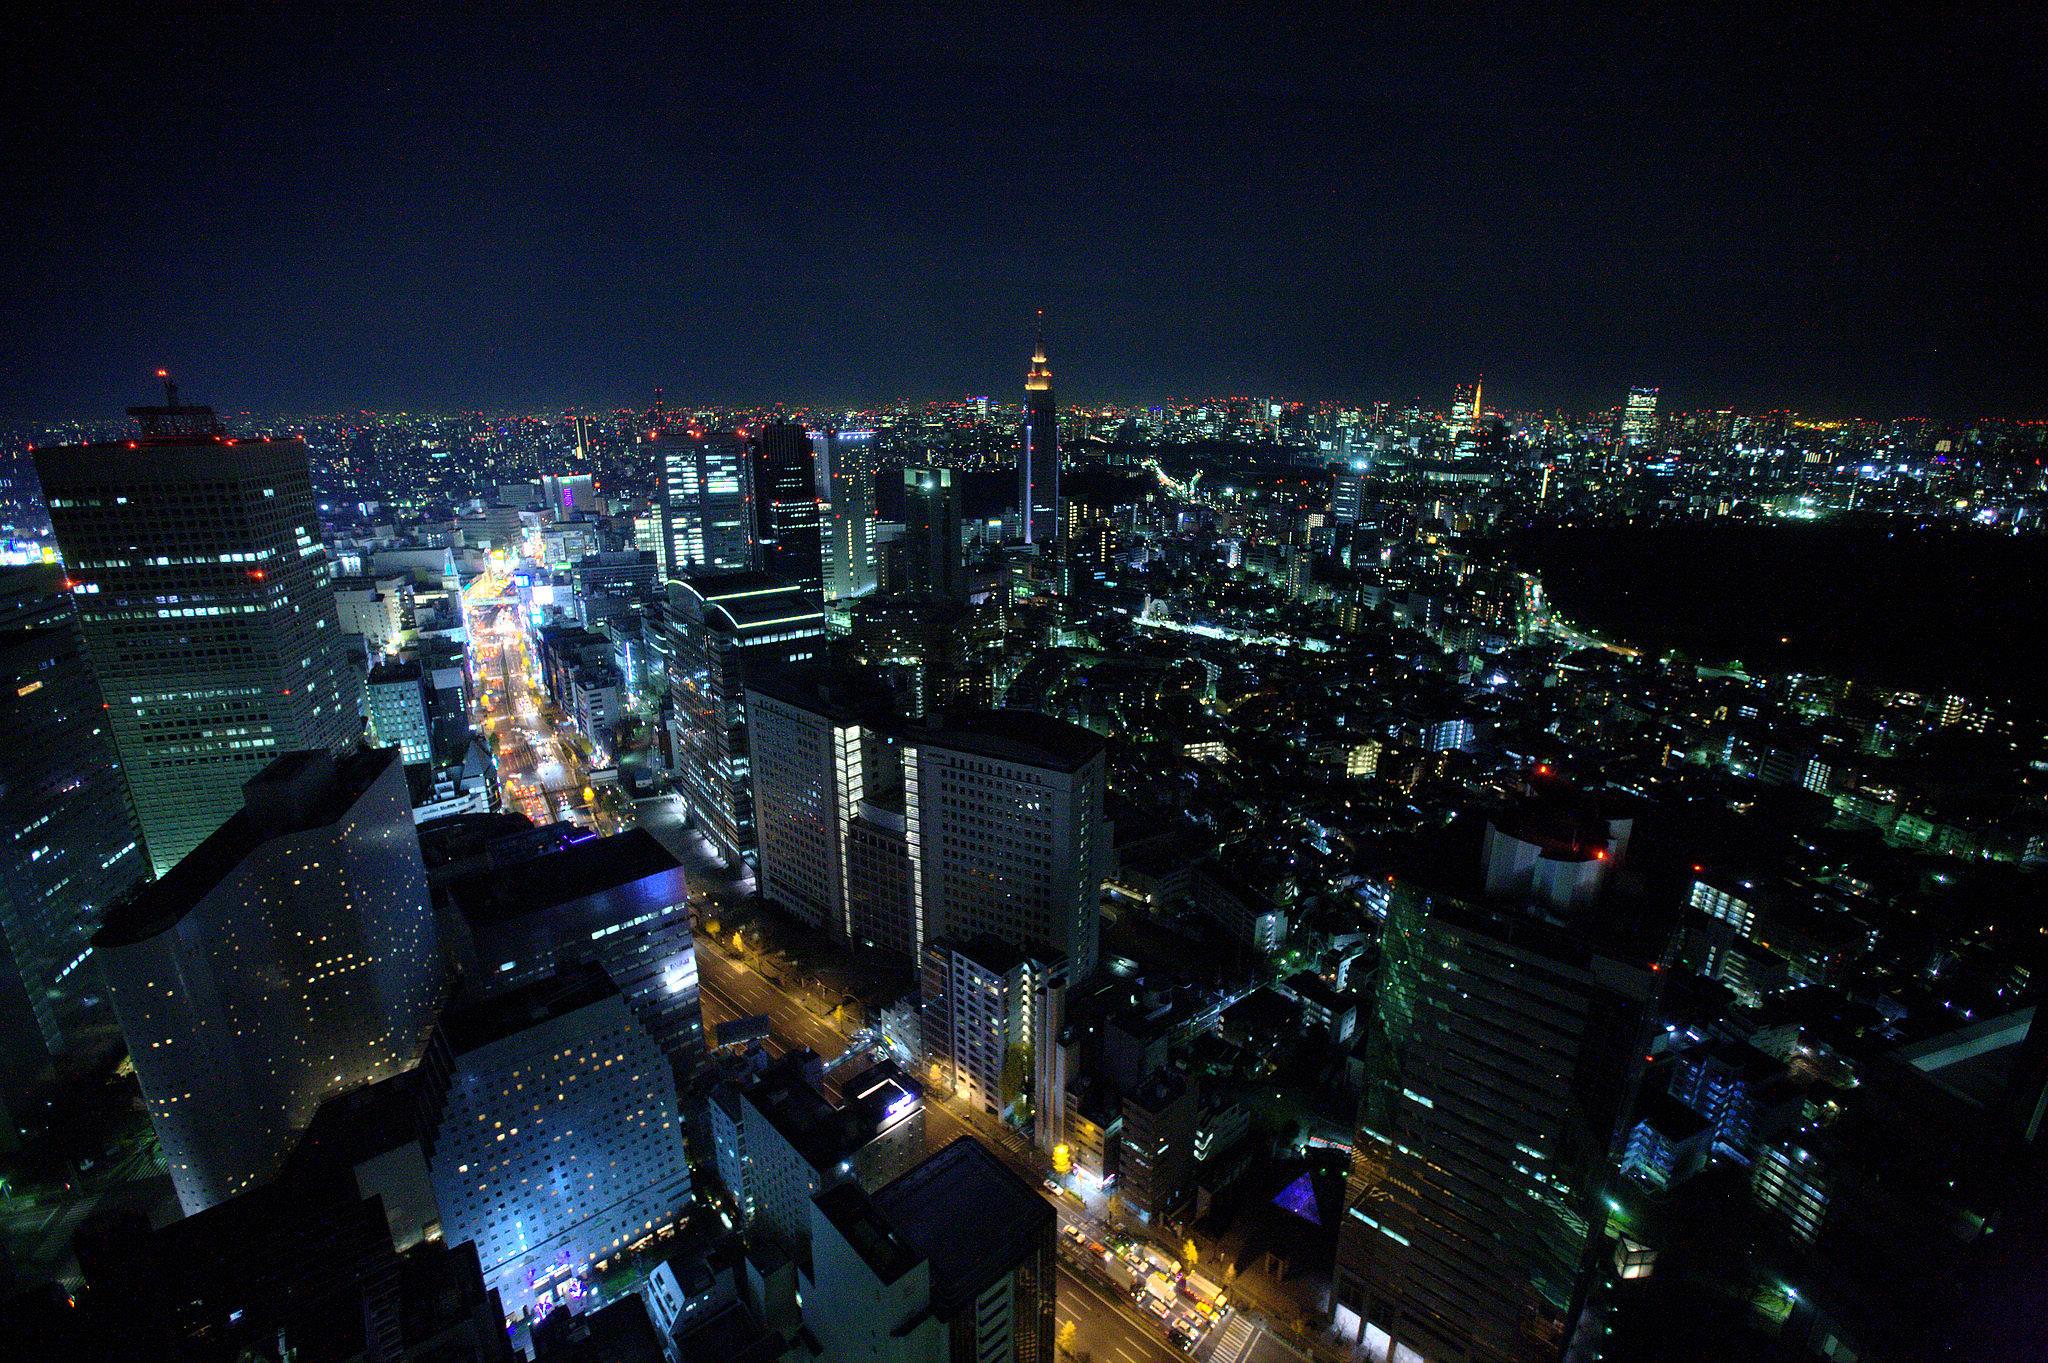 Kozue, Tokyo - View from Kozue